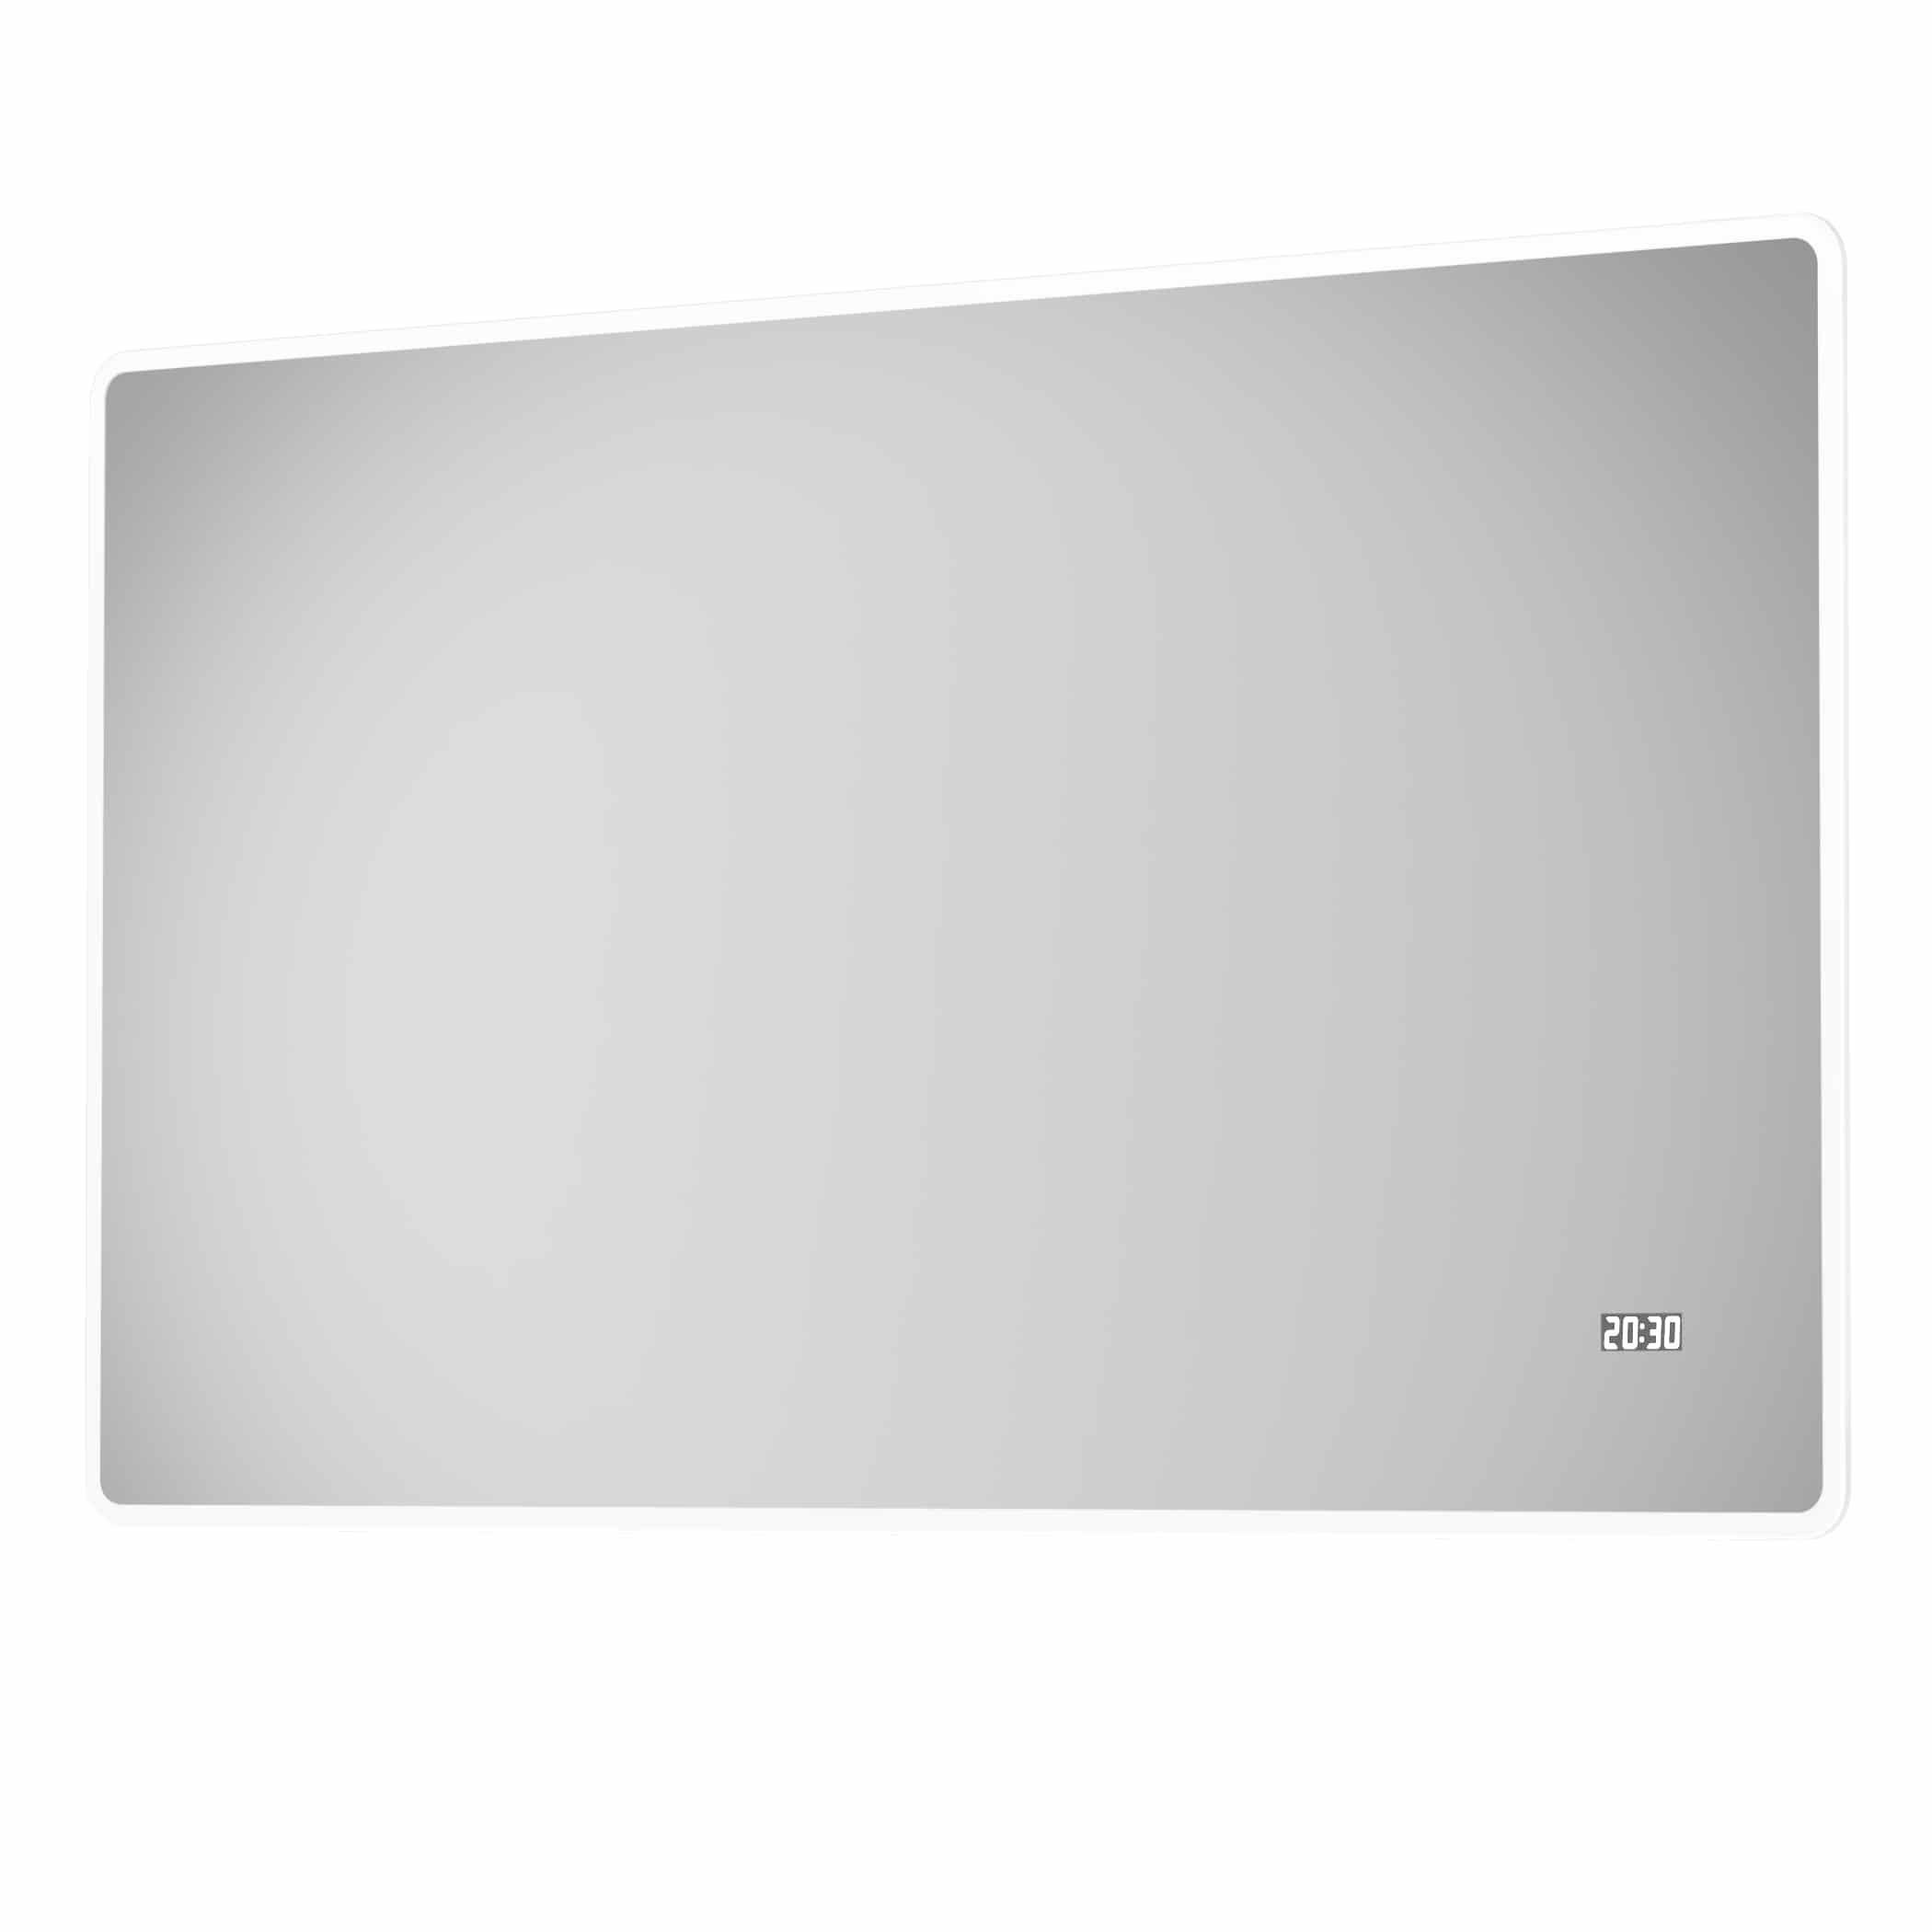 Badezimmerspiegel 120 Cm.Badezimmerspiegel 120cm Breite Talos Sun Lichtspiegel Shop